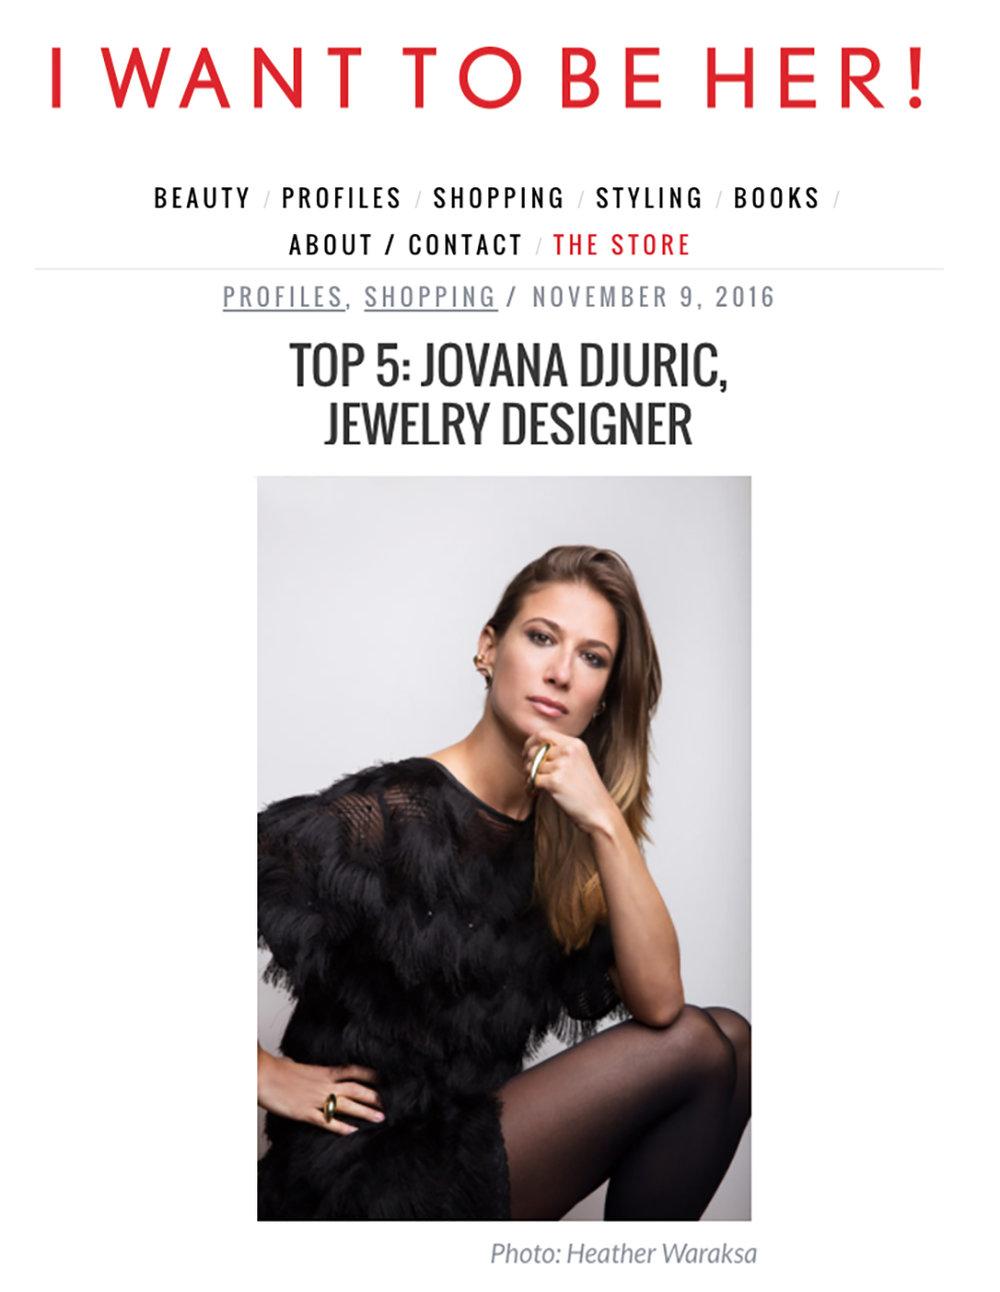 Jovana Djuric I want to be her Blog November 2016.jpg